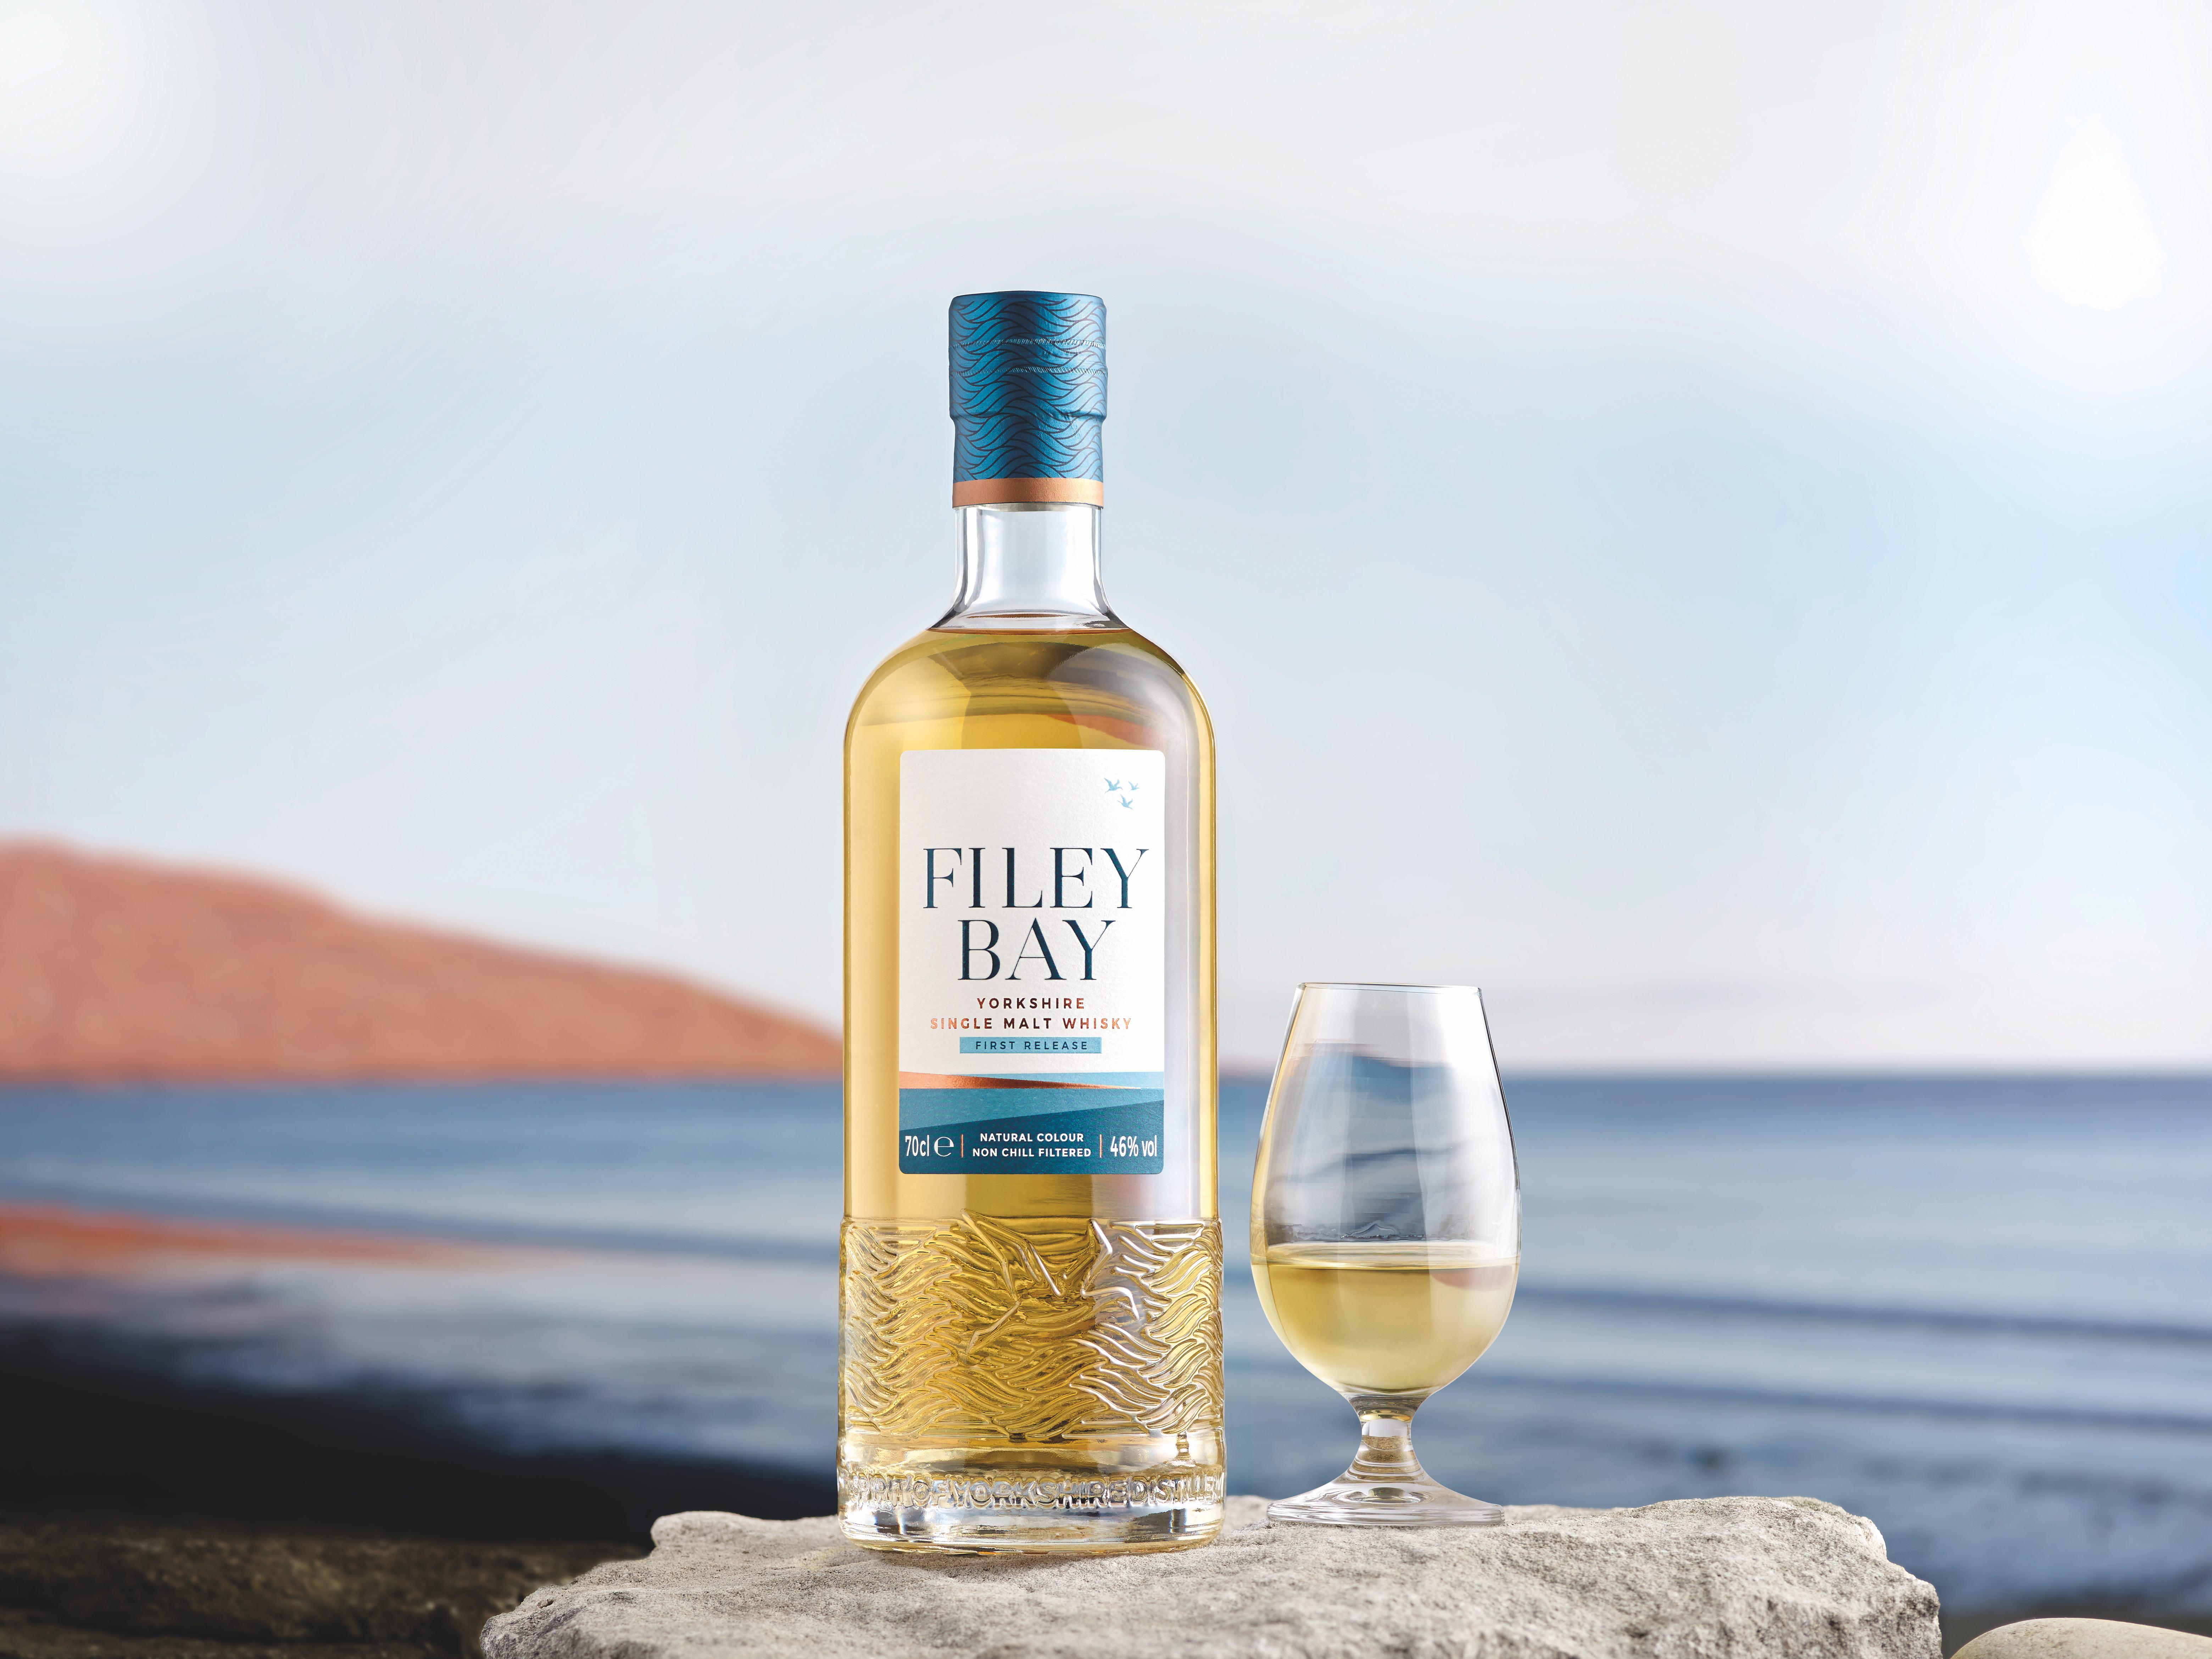 Filey Bay Whisky